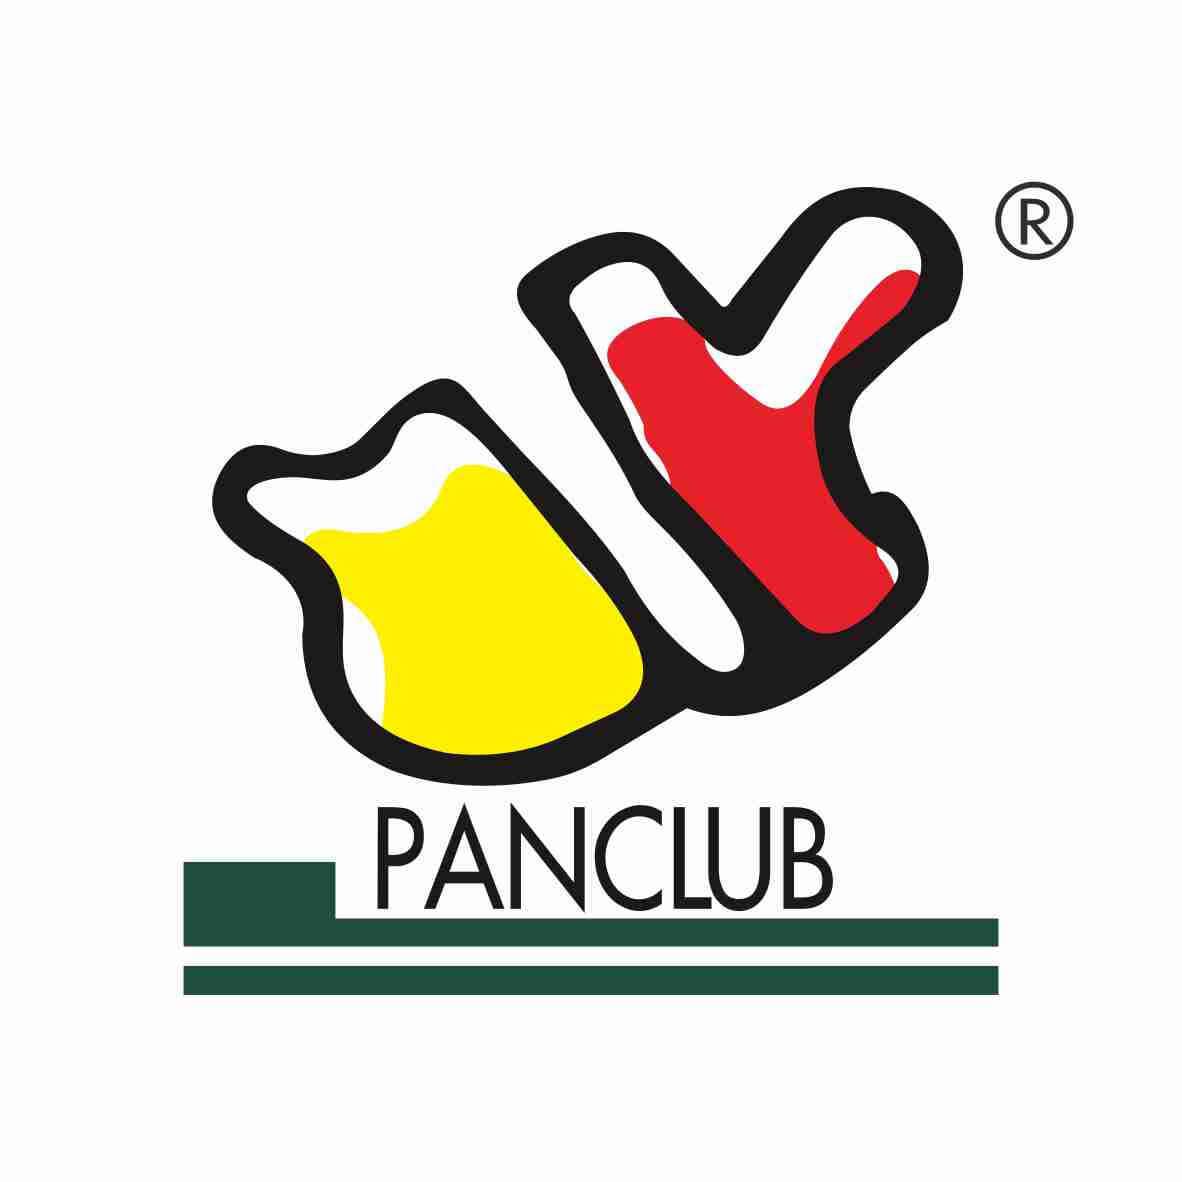 Panclub